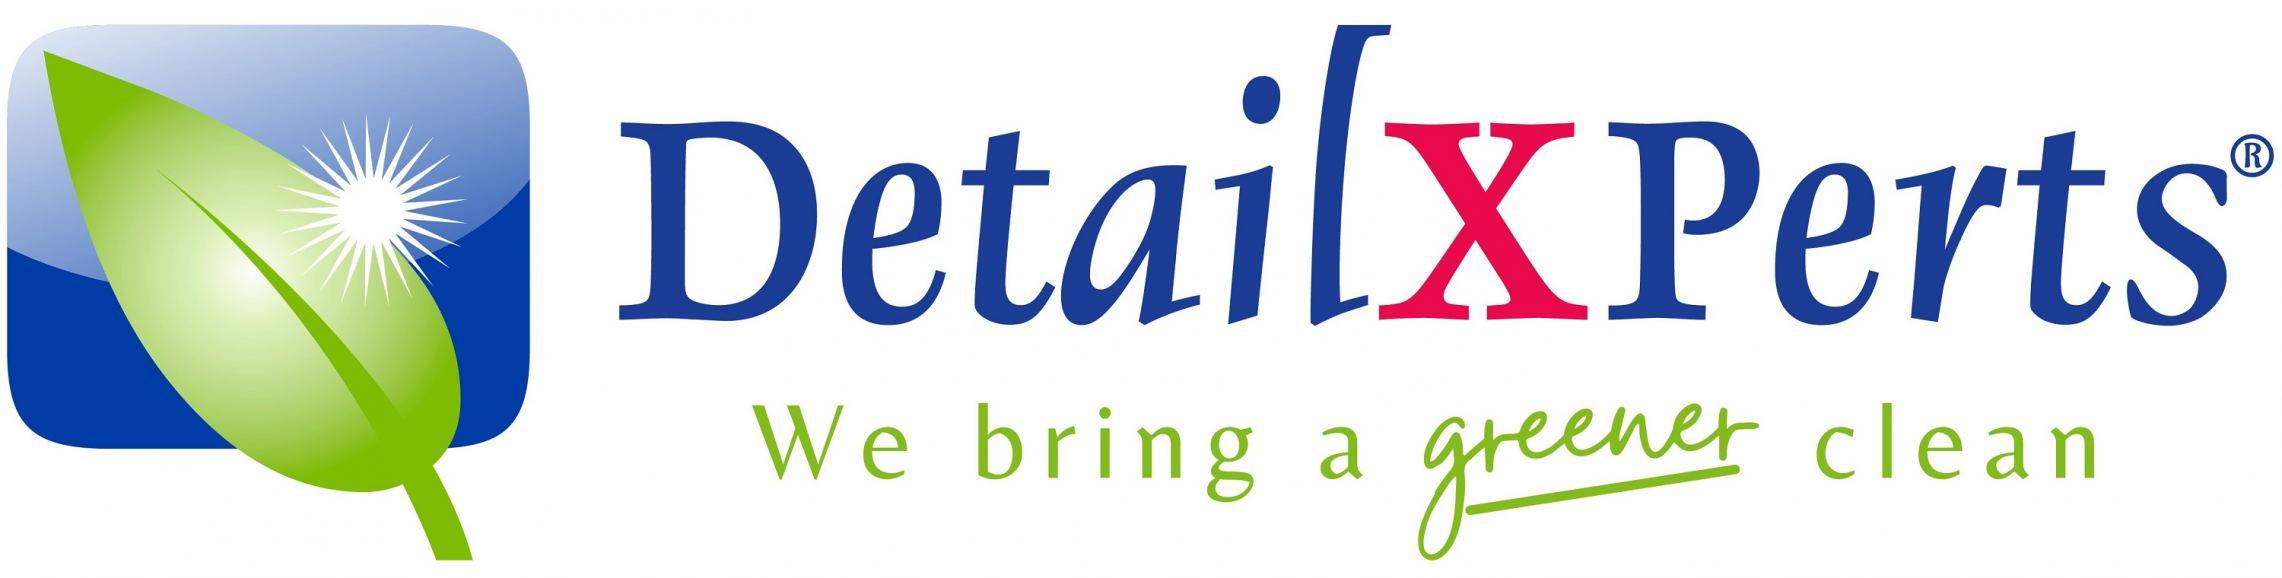 DetailXPerts Franchise Logo